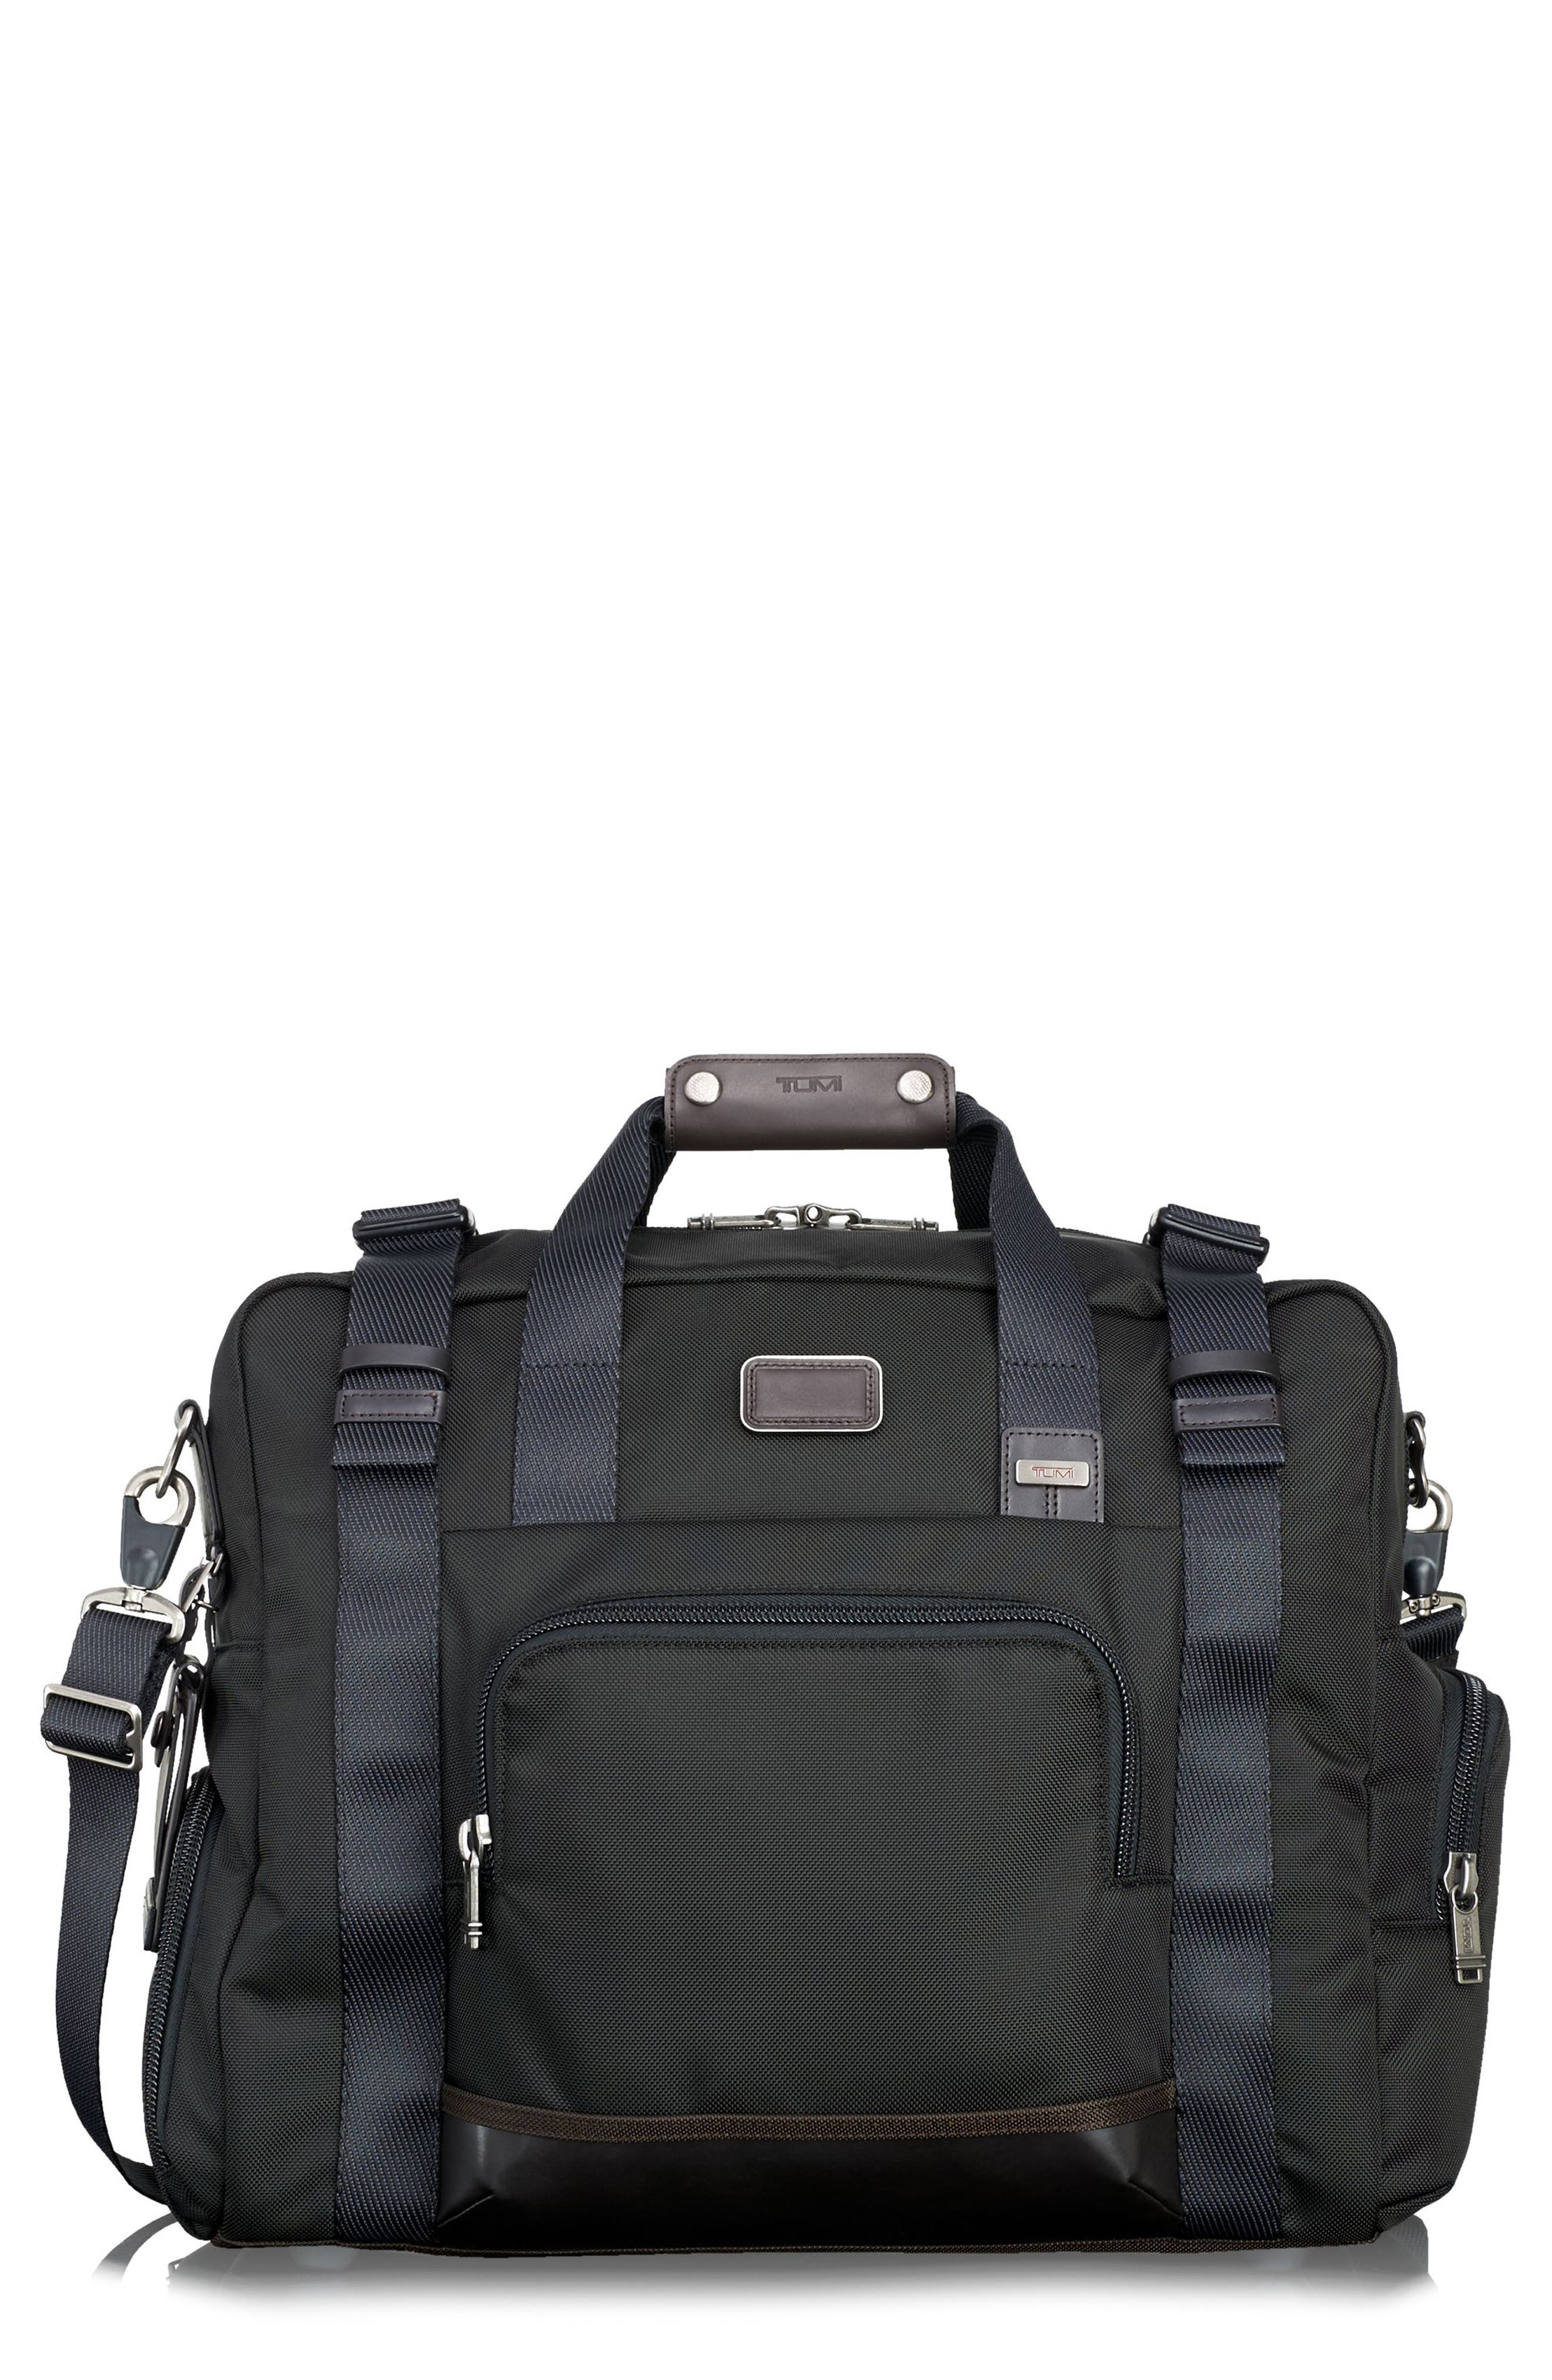 Alpha Bravo Buckner Duffel Bag,                             Main thumbnail 1, color,                             001